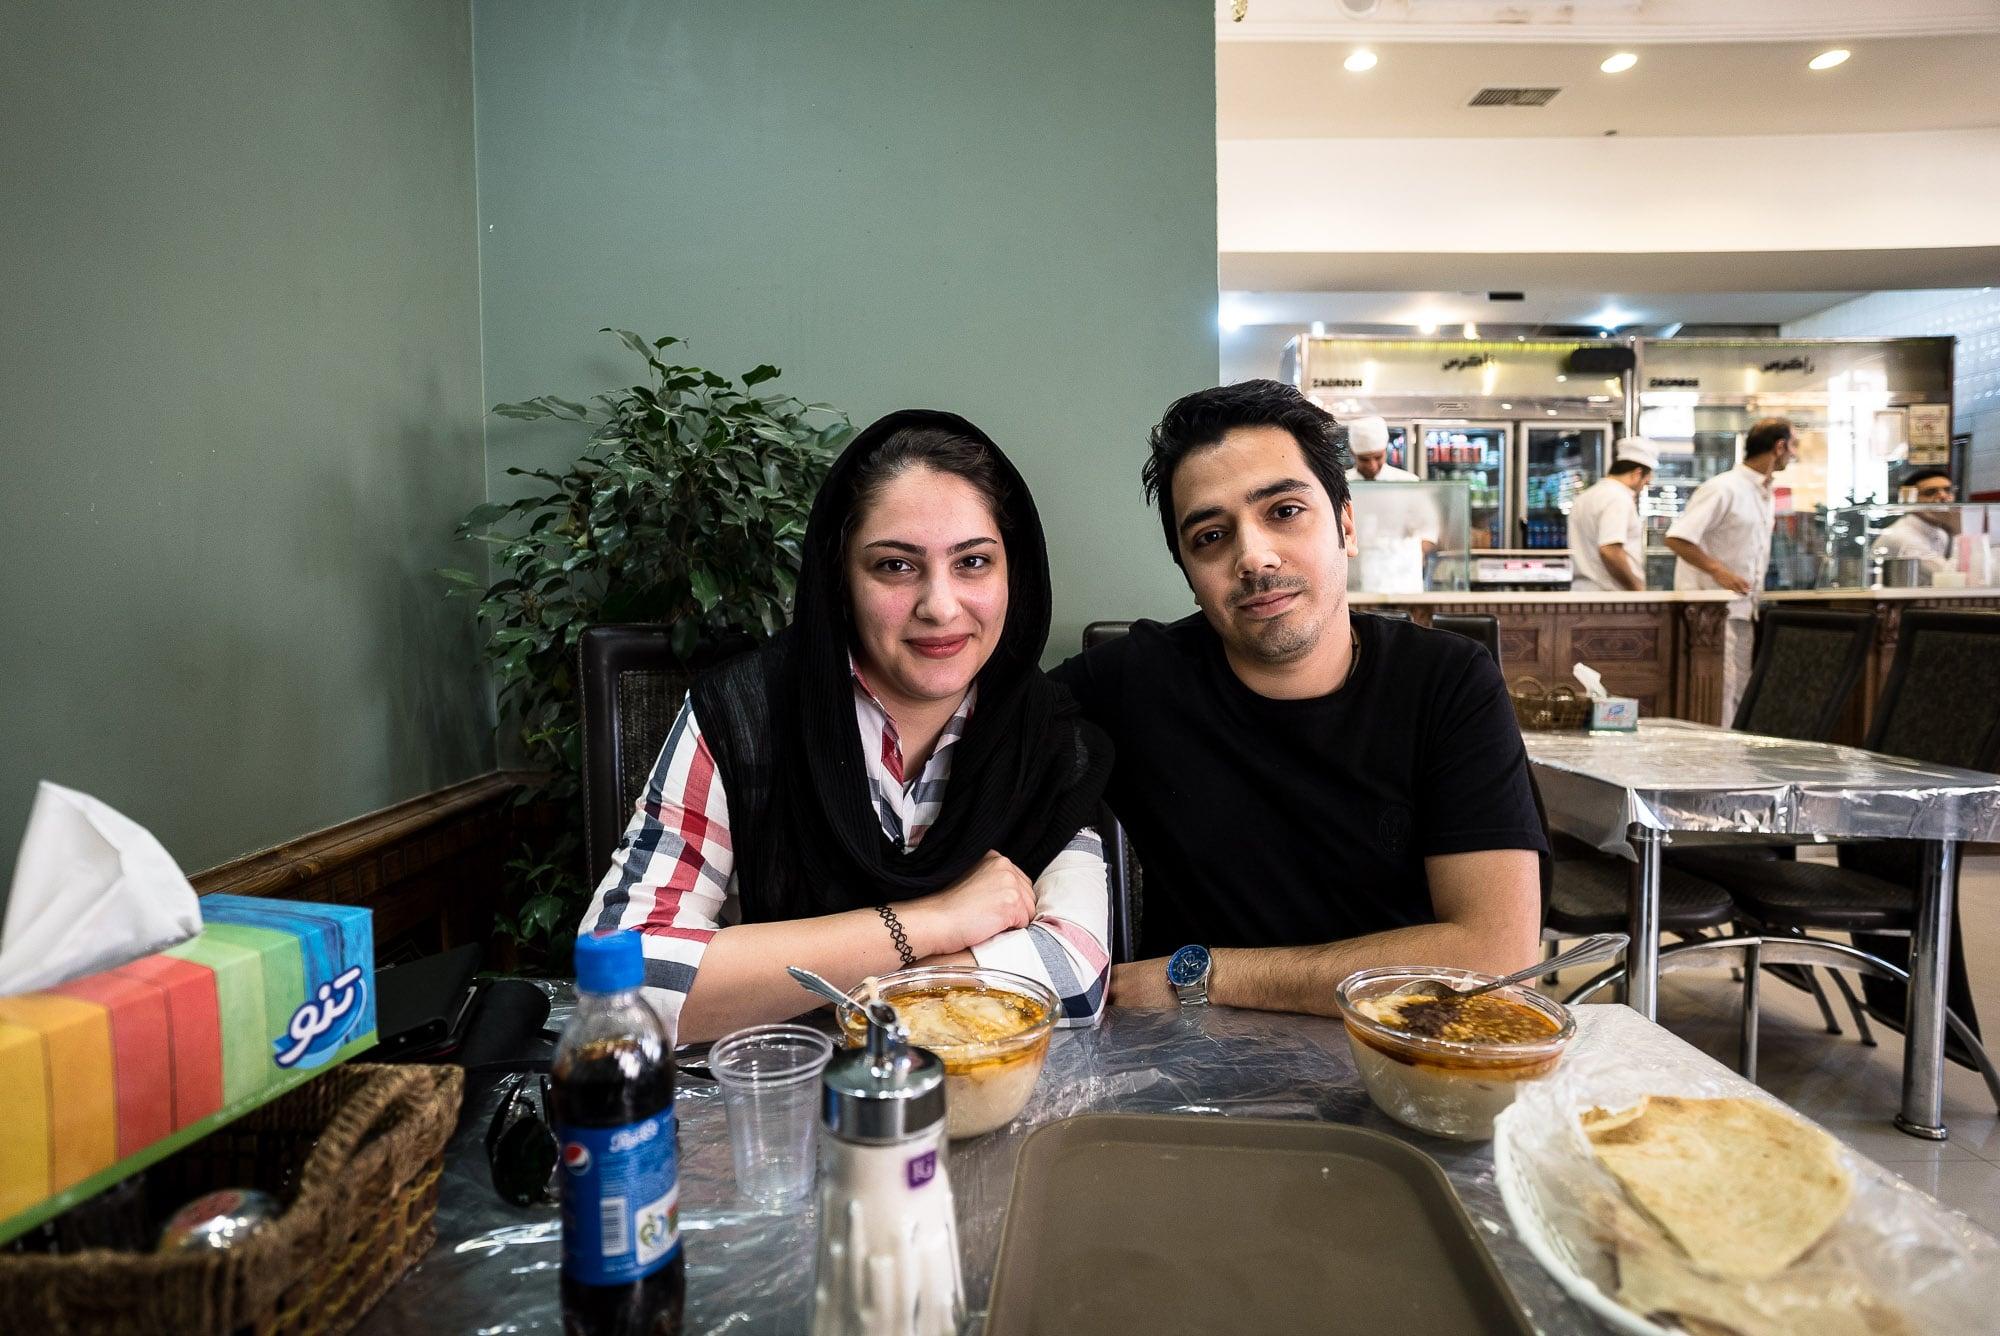 Leila and her husband